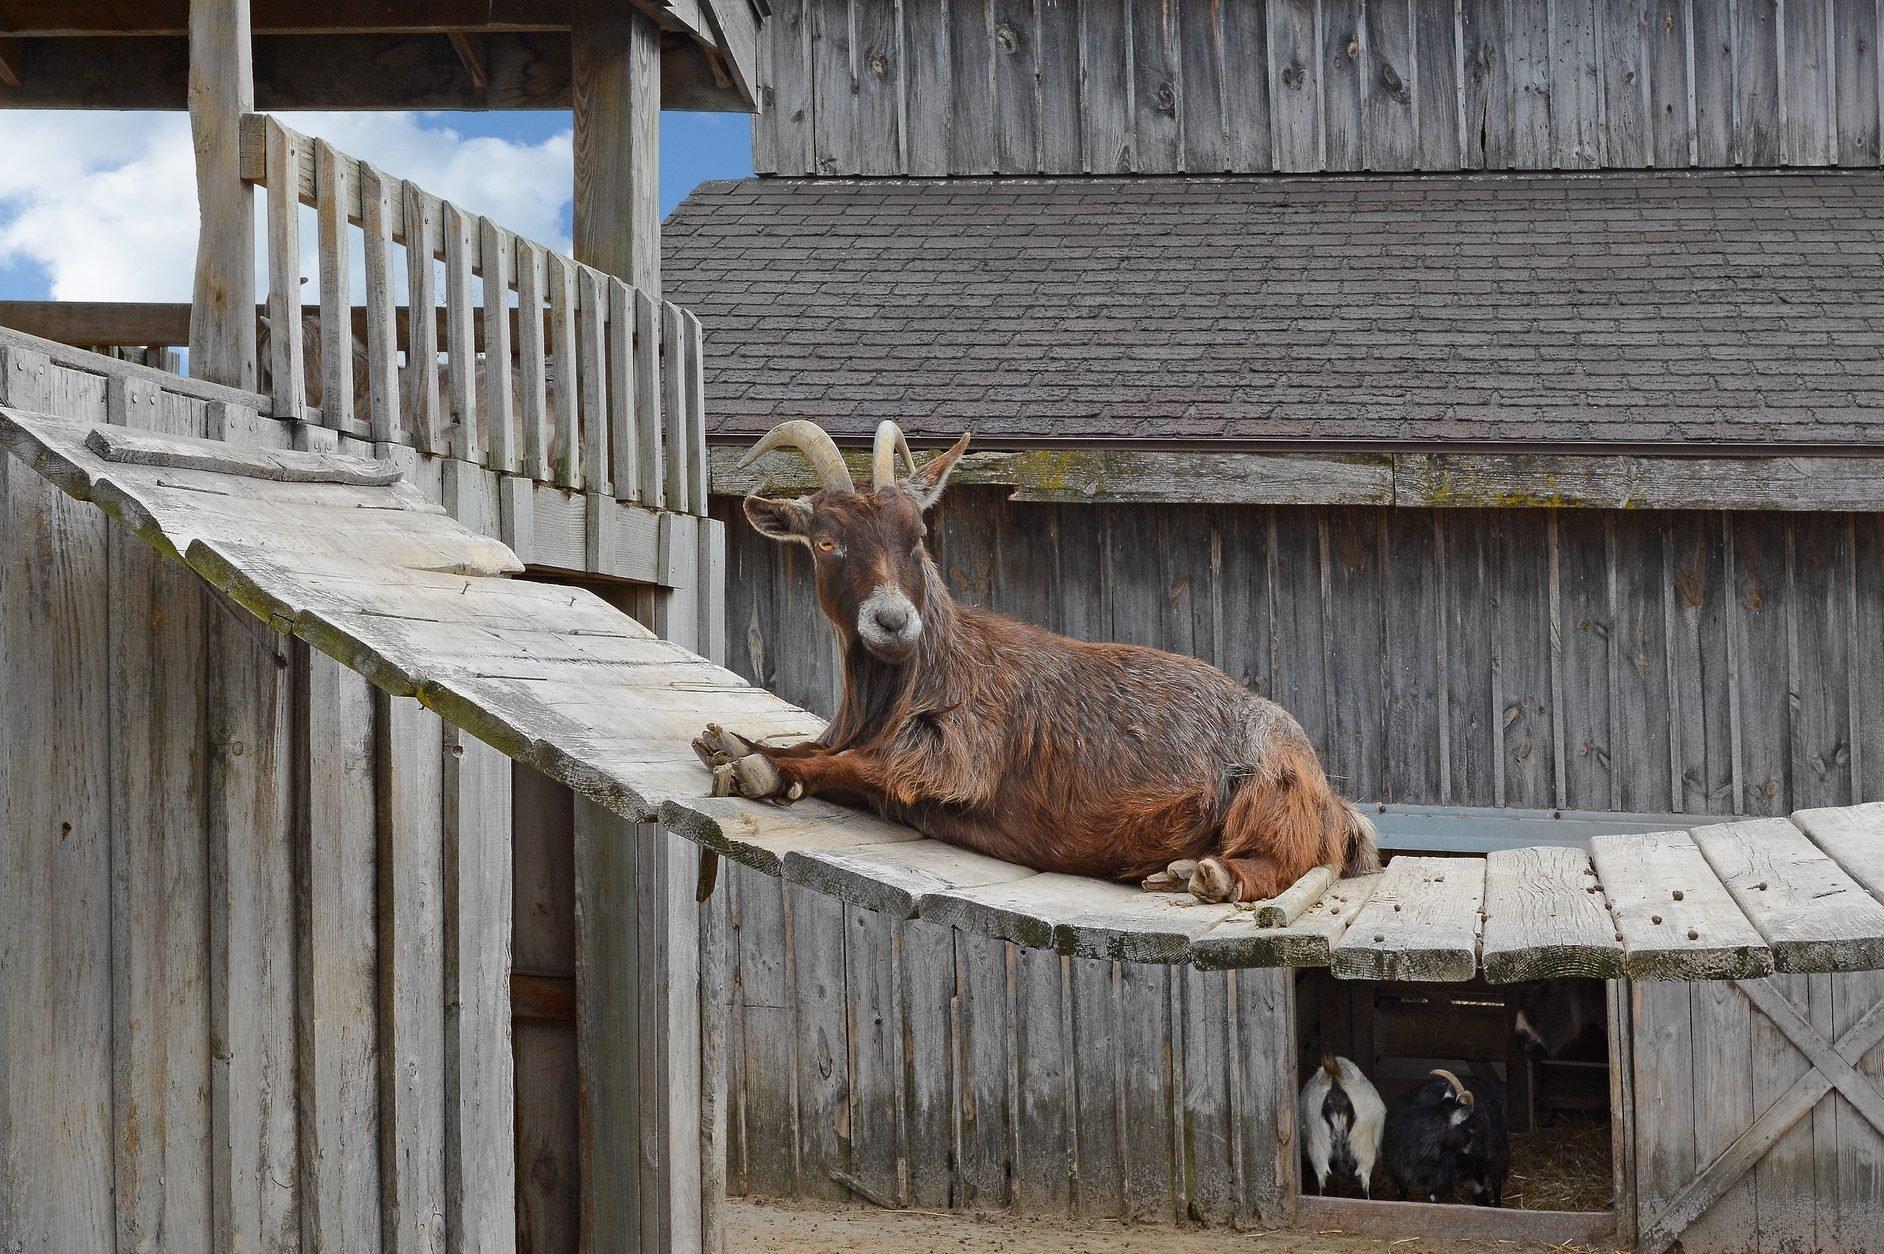 Gruff goat lying on a bridge